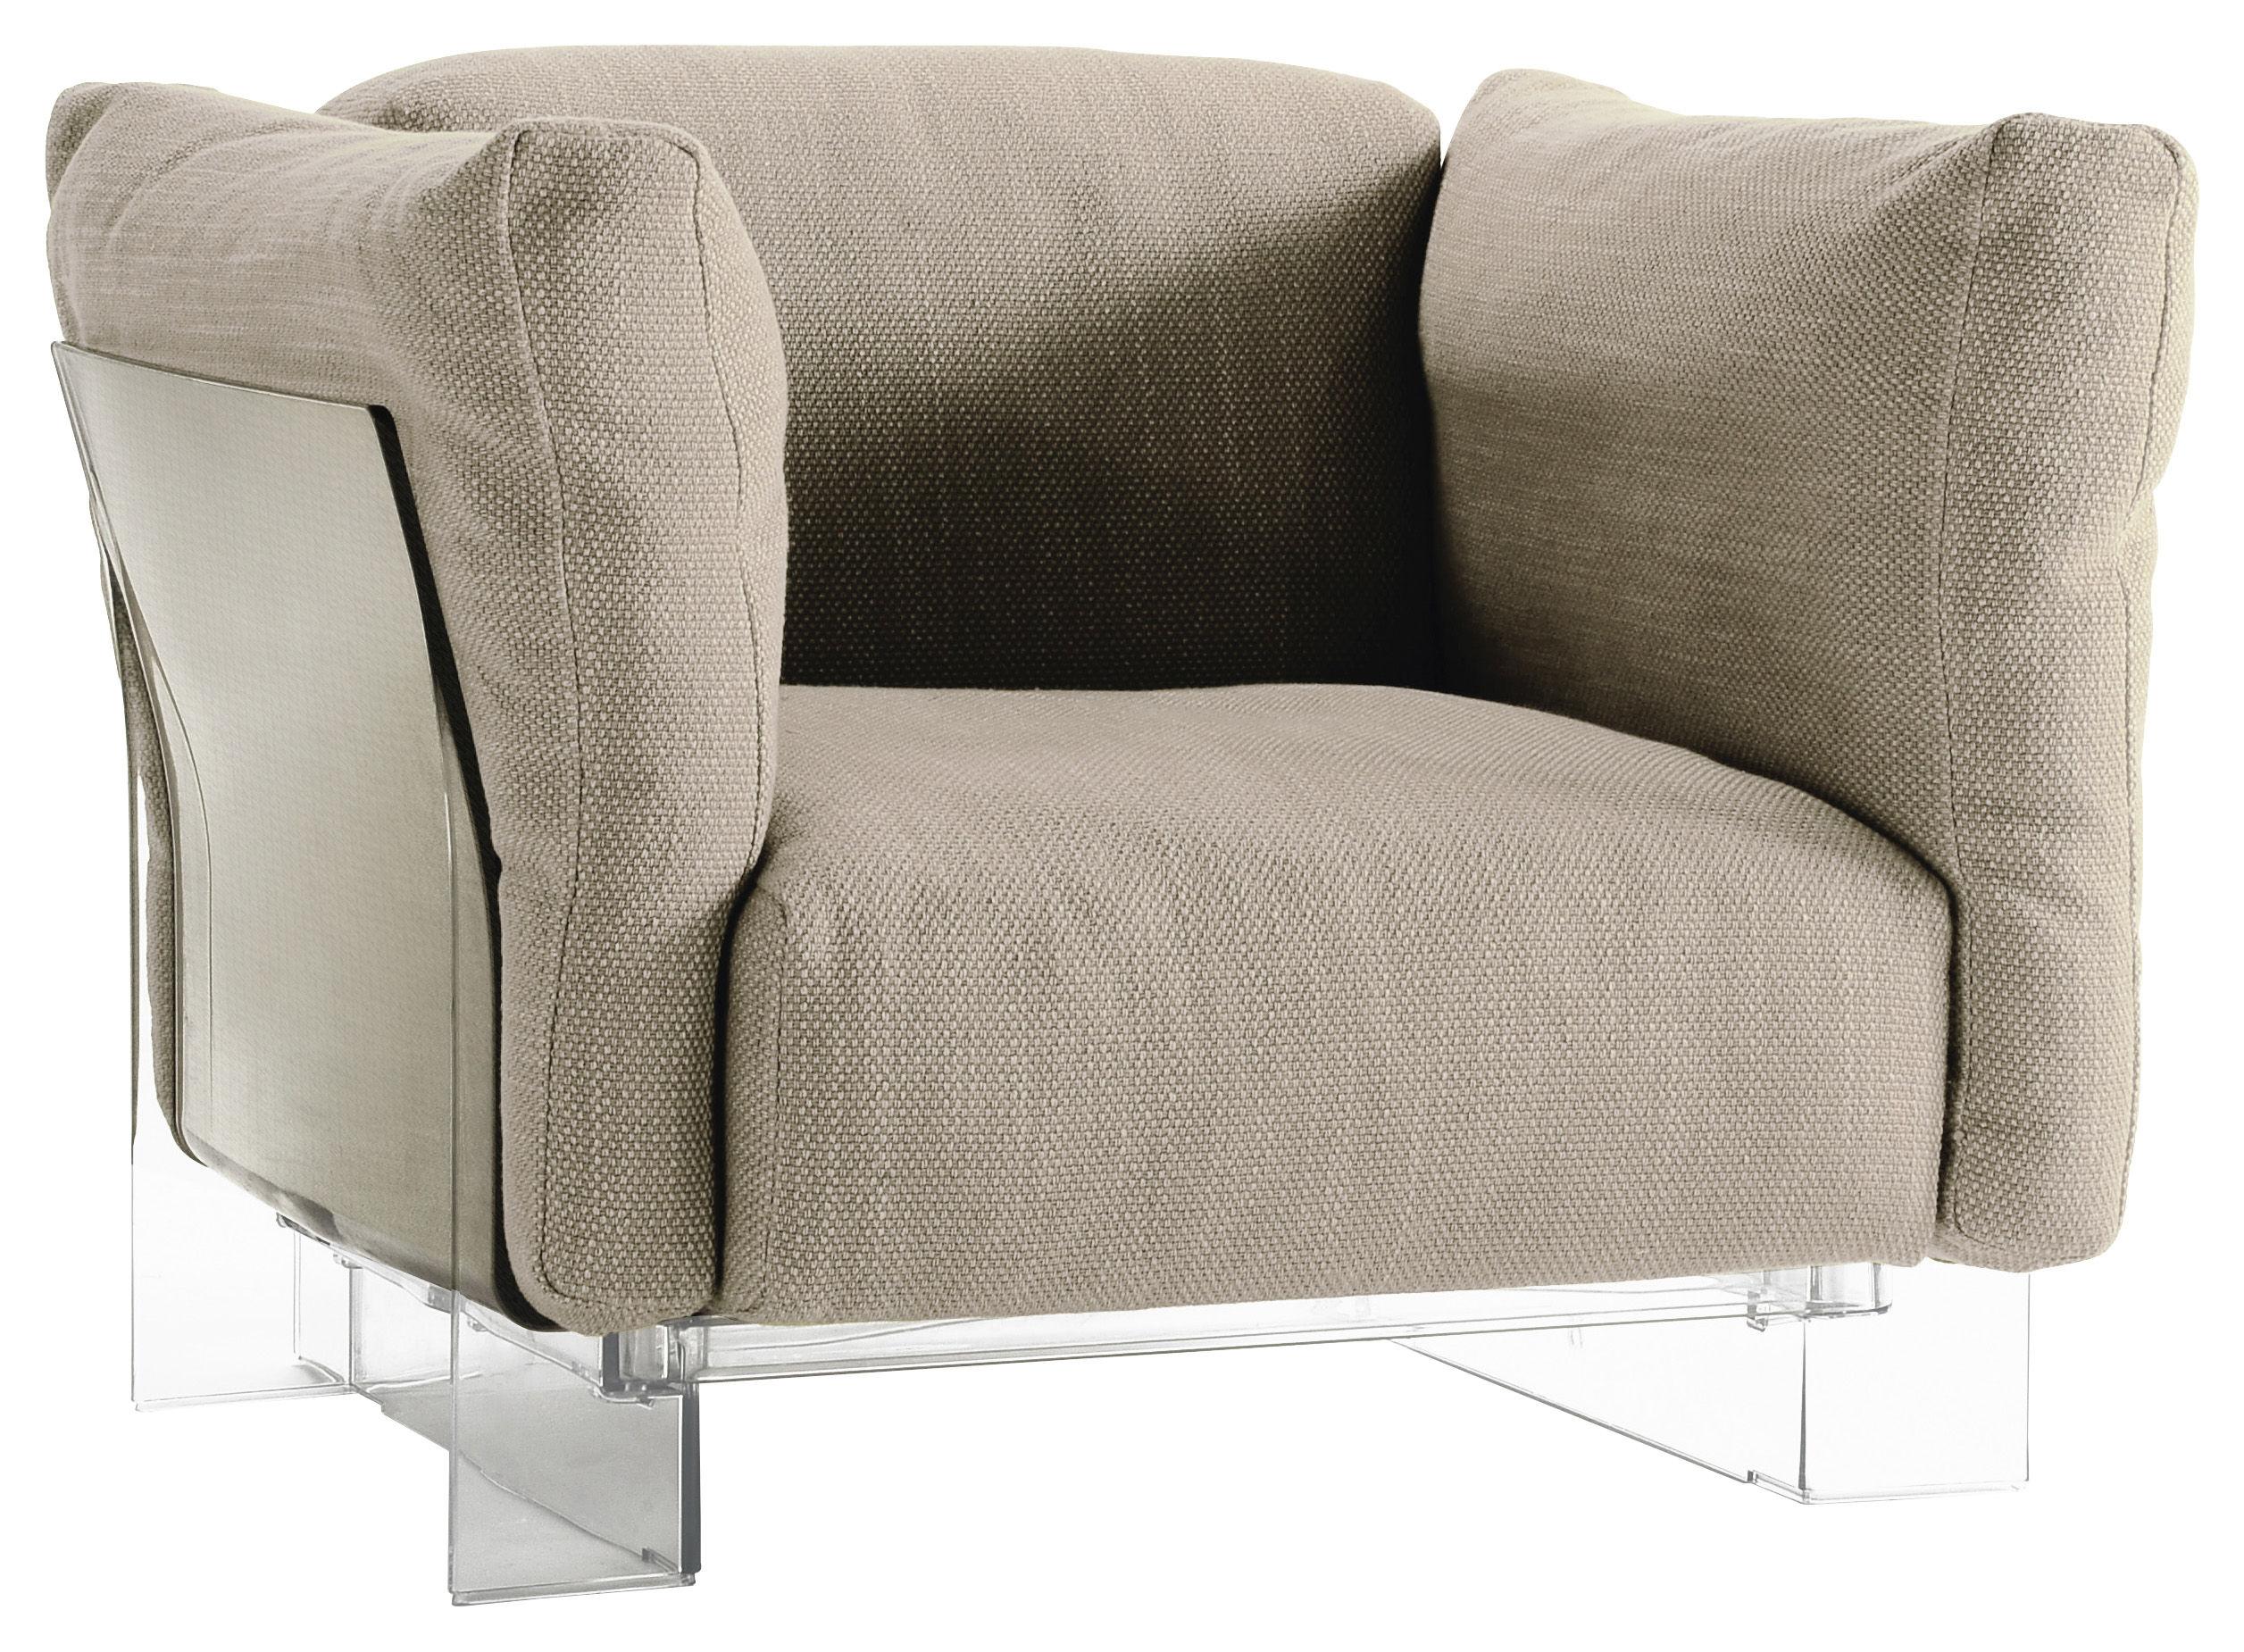 fauteuil rembourr pop duo structure transparente ecru kartell. Black Bedroom Furniture Sets. Home Design Ideas